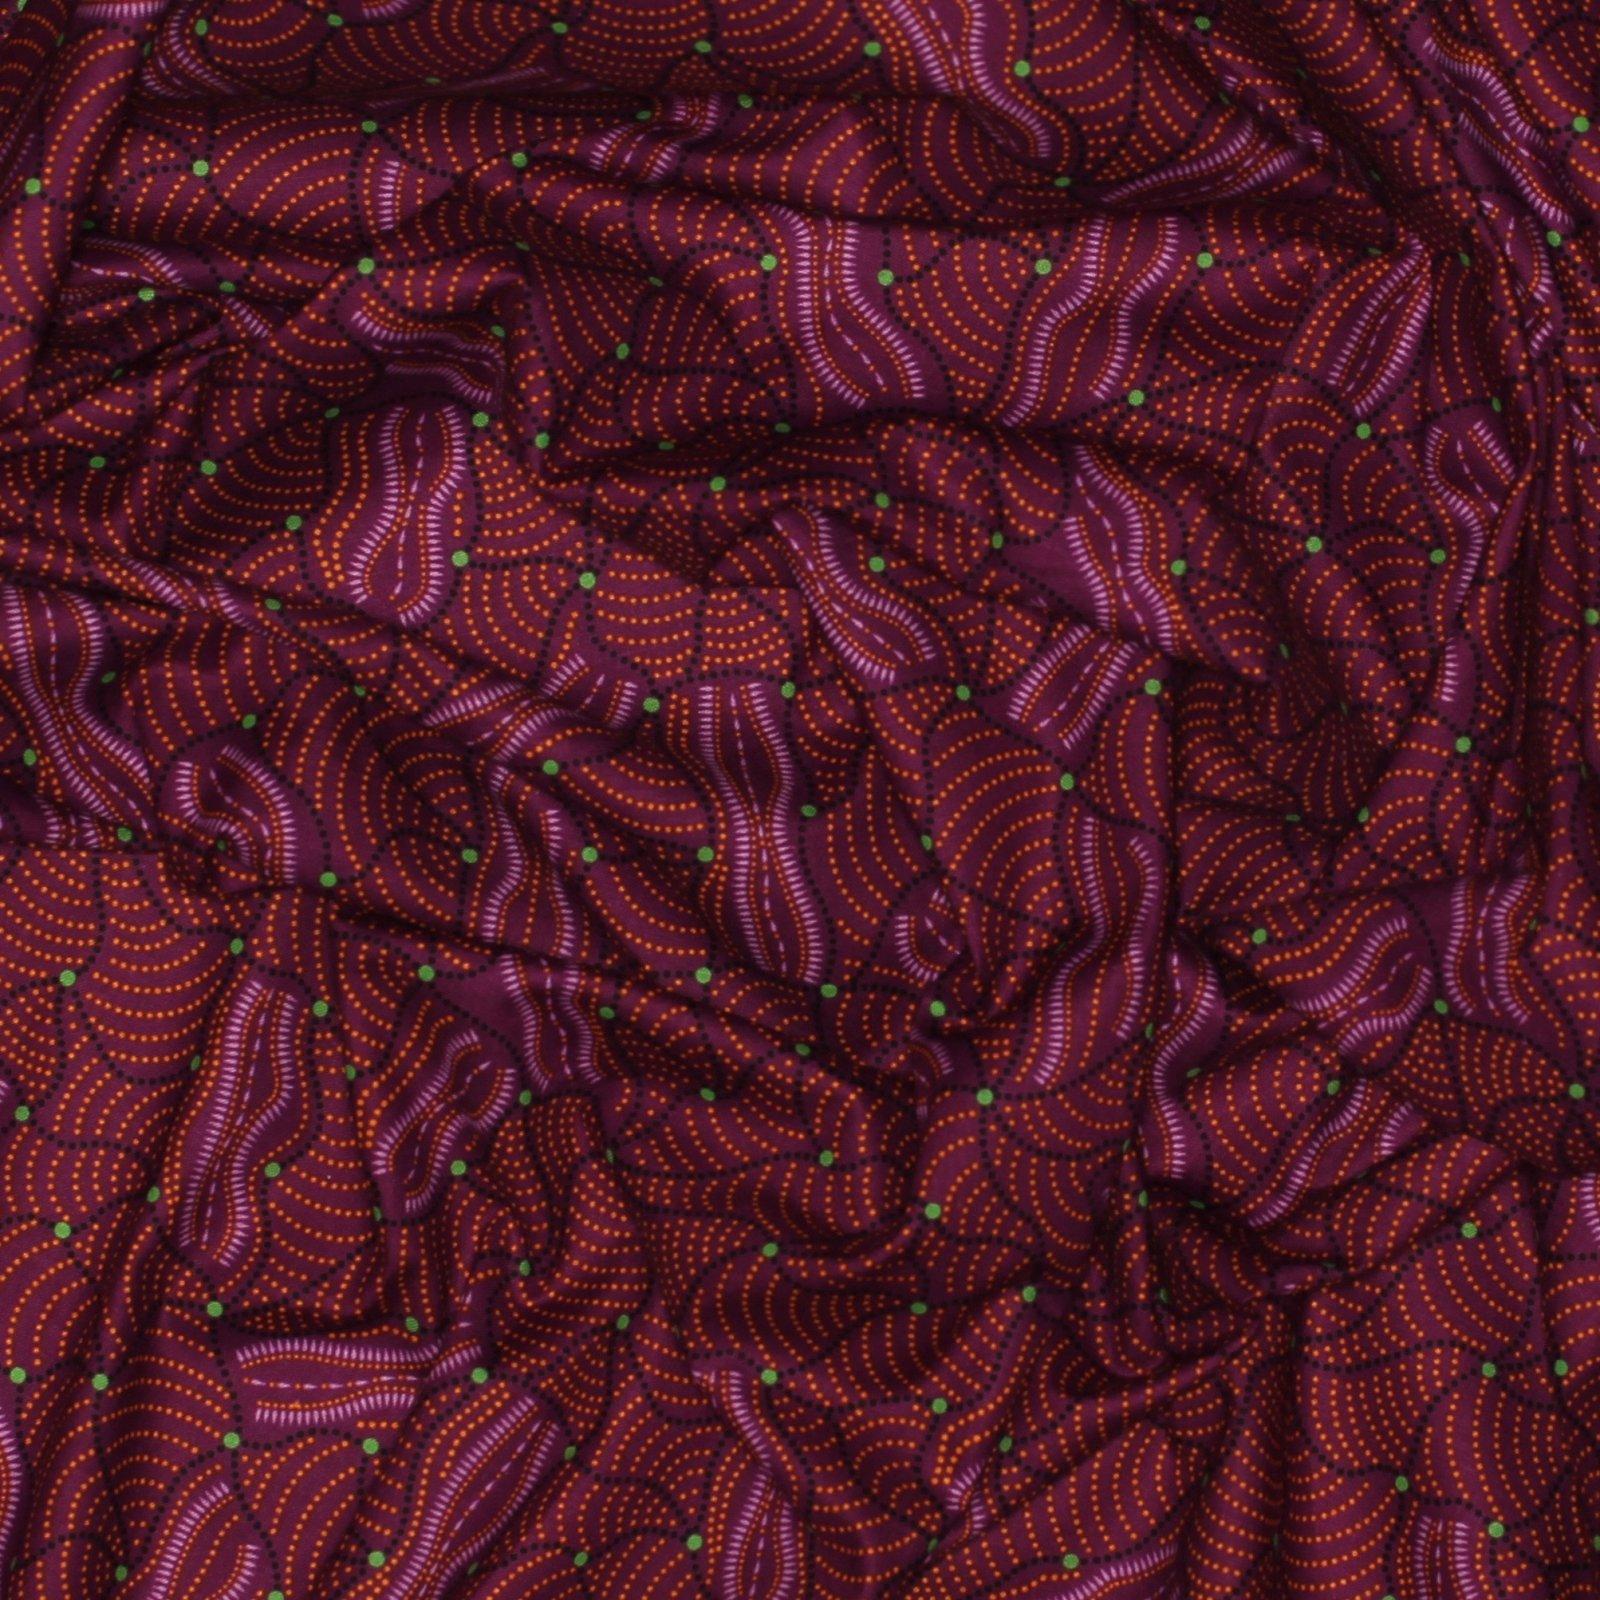 Wild Flower Dreaming 2 - Purple - Australian Aboriginal Textiles